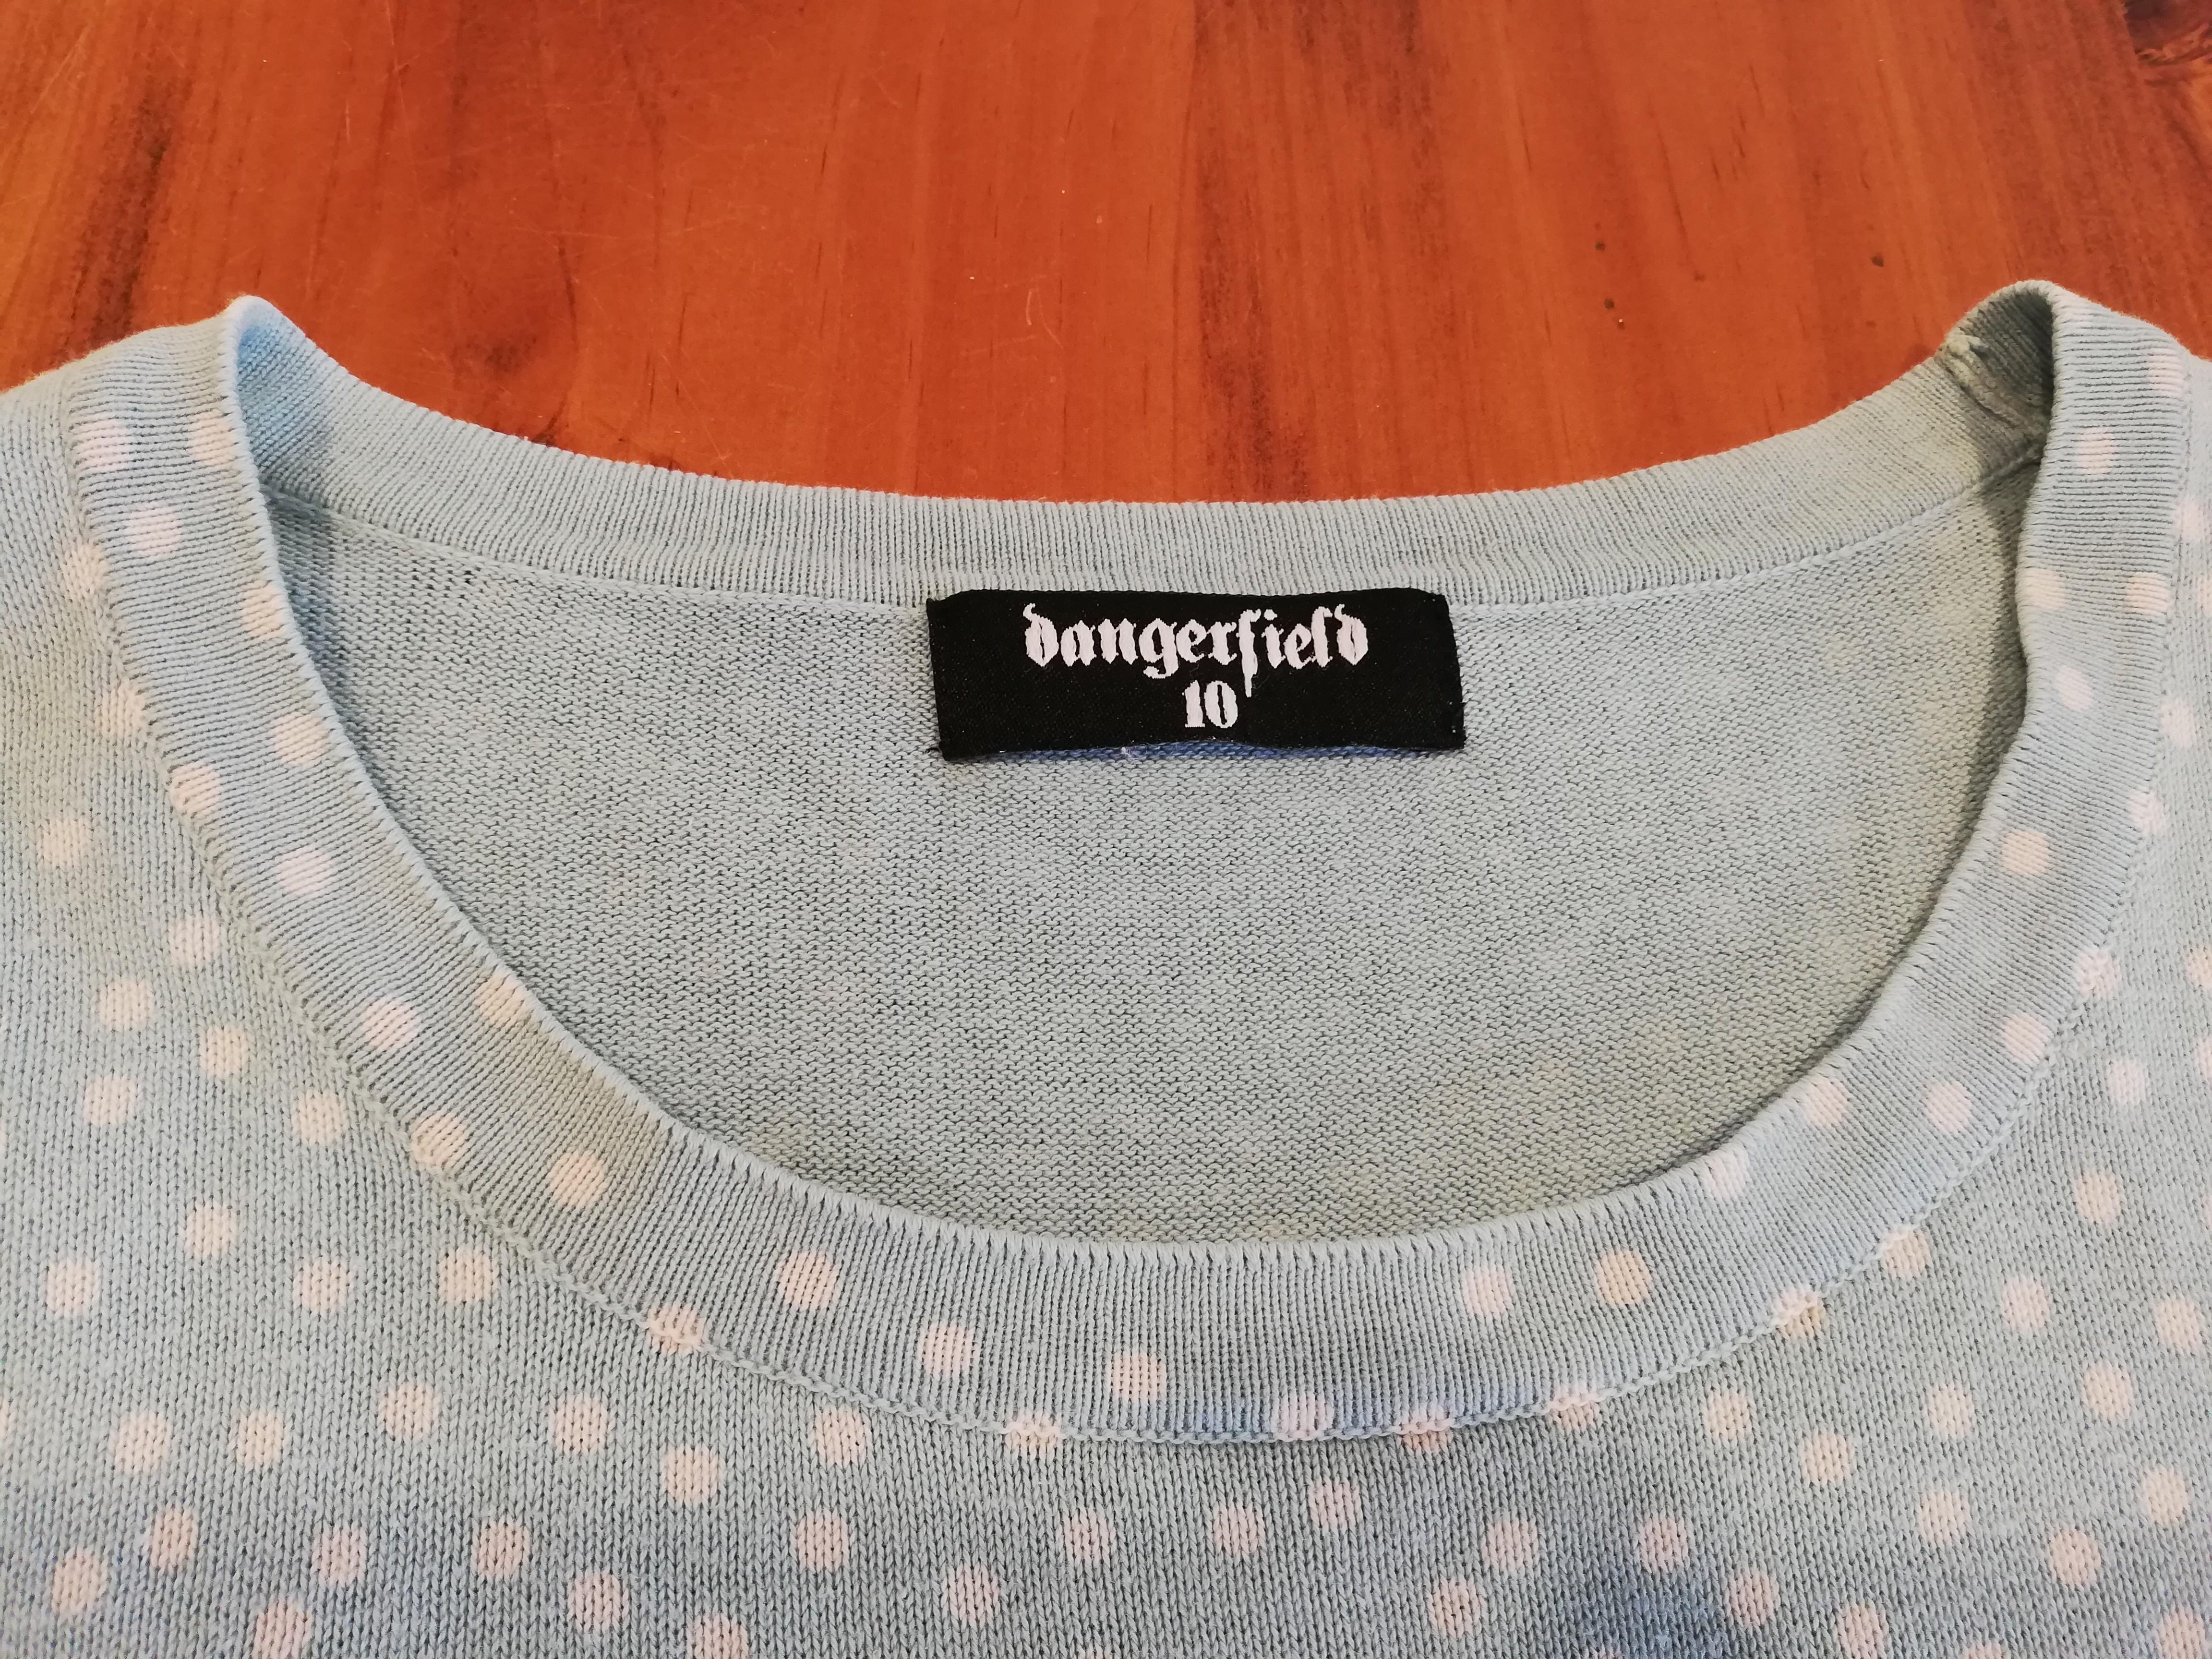 10/M - Dangerfield - Light Blue Short-Sleeve Jumper w White Polka Dots